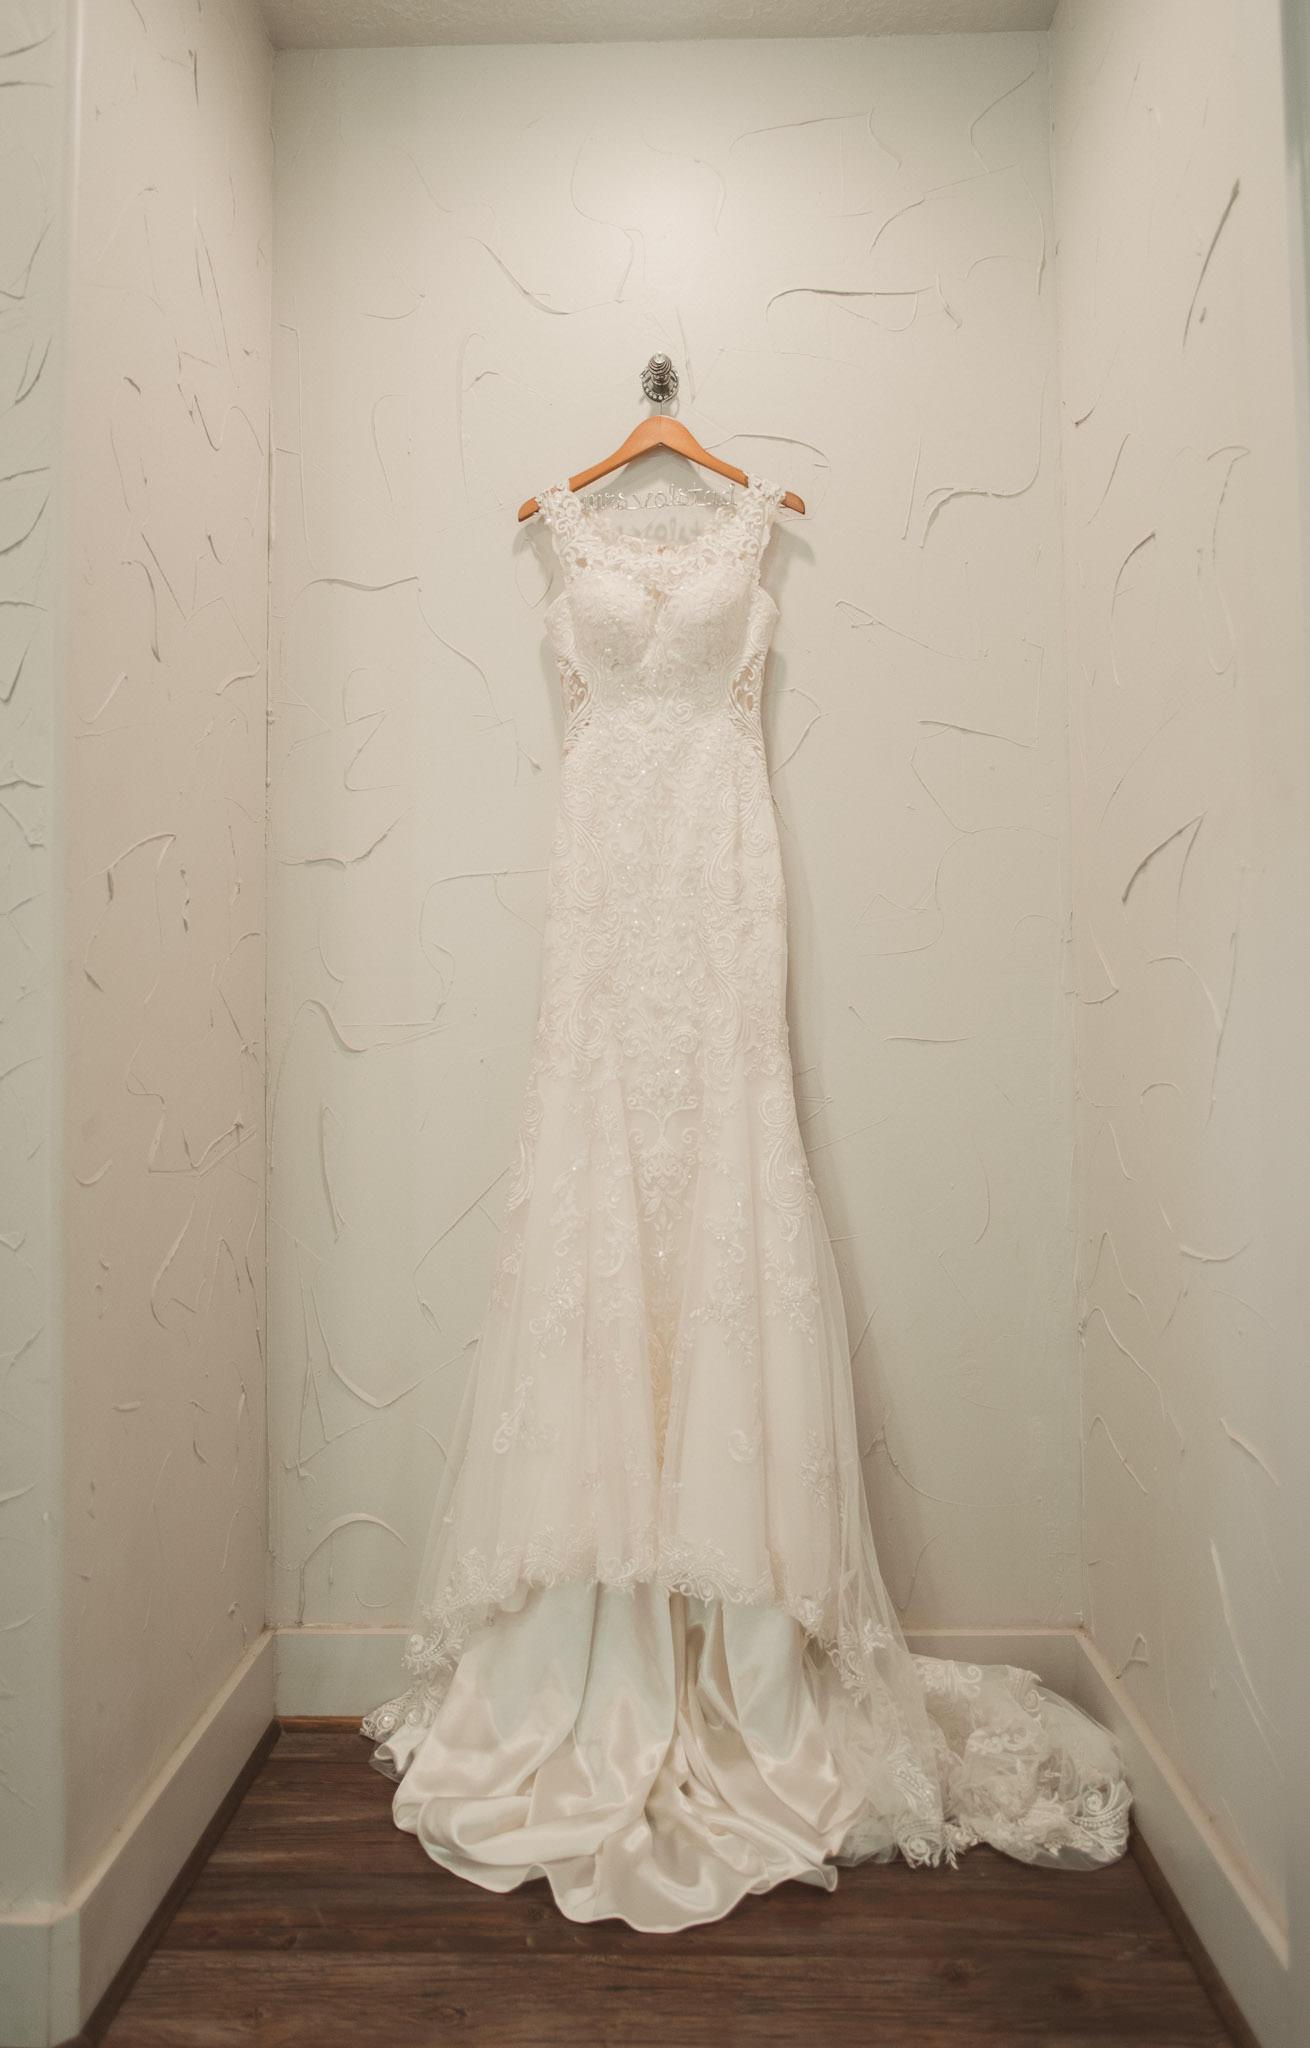 nichole-kyle-magnolia-bells-magnolia-wedding-sm-49.jpg